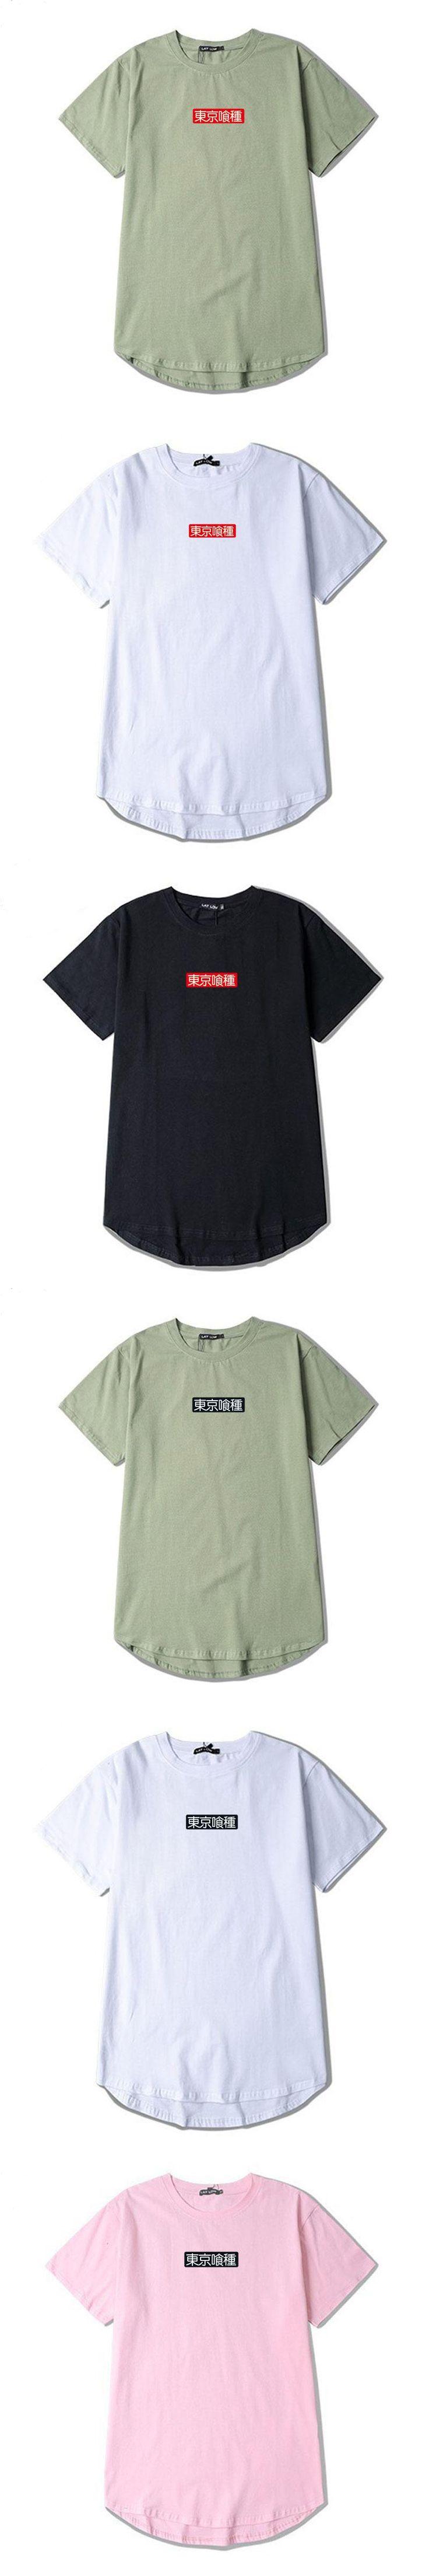 Tokyo Ghoul Cosplay Anime T Shirt Men Letter Printed Length Short Sleeves Suprem Funny T-Shirt Harajuku Hip Hop Swag Summer Tops